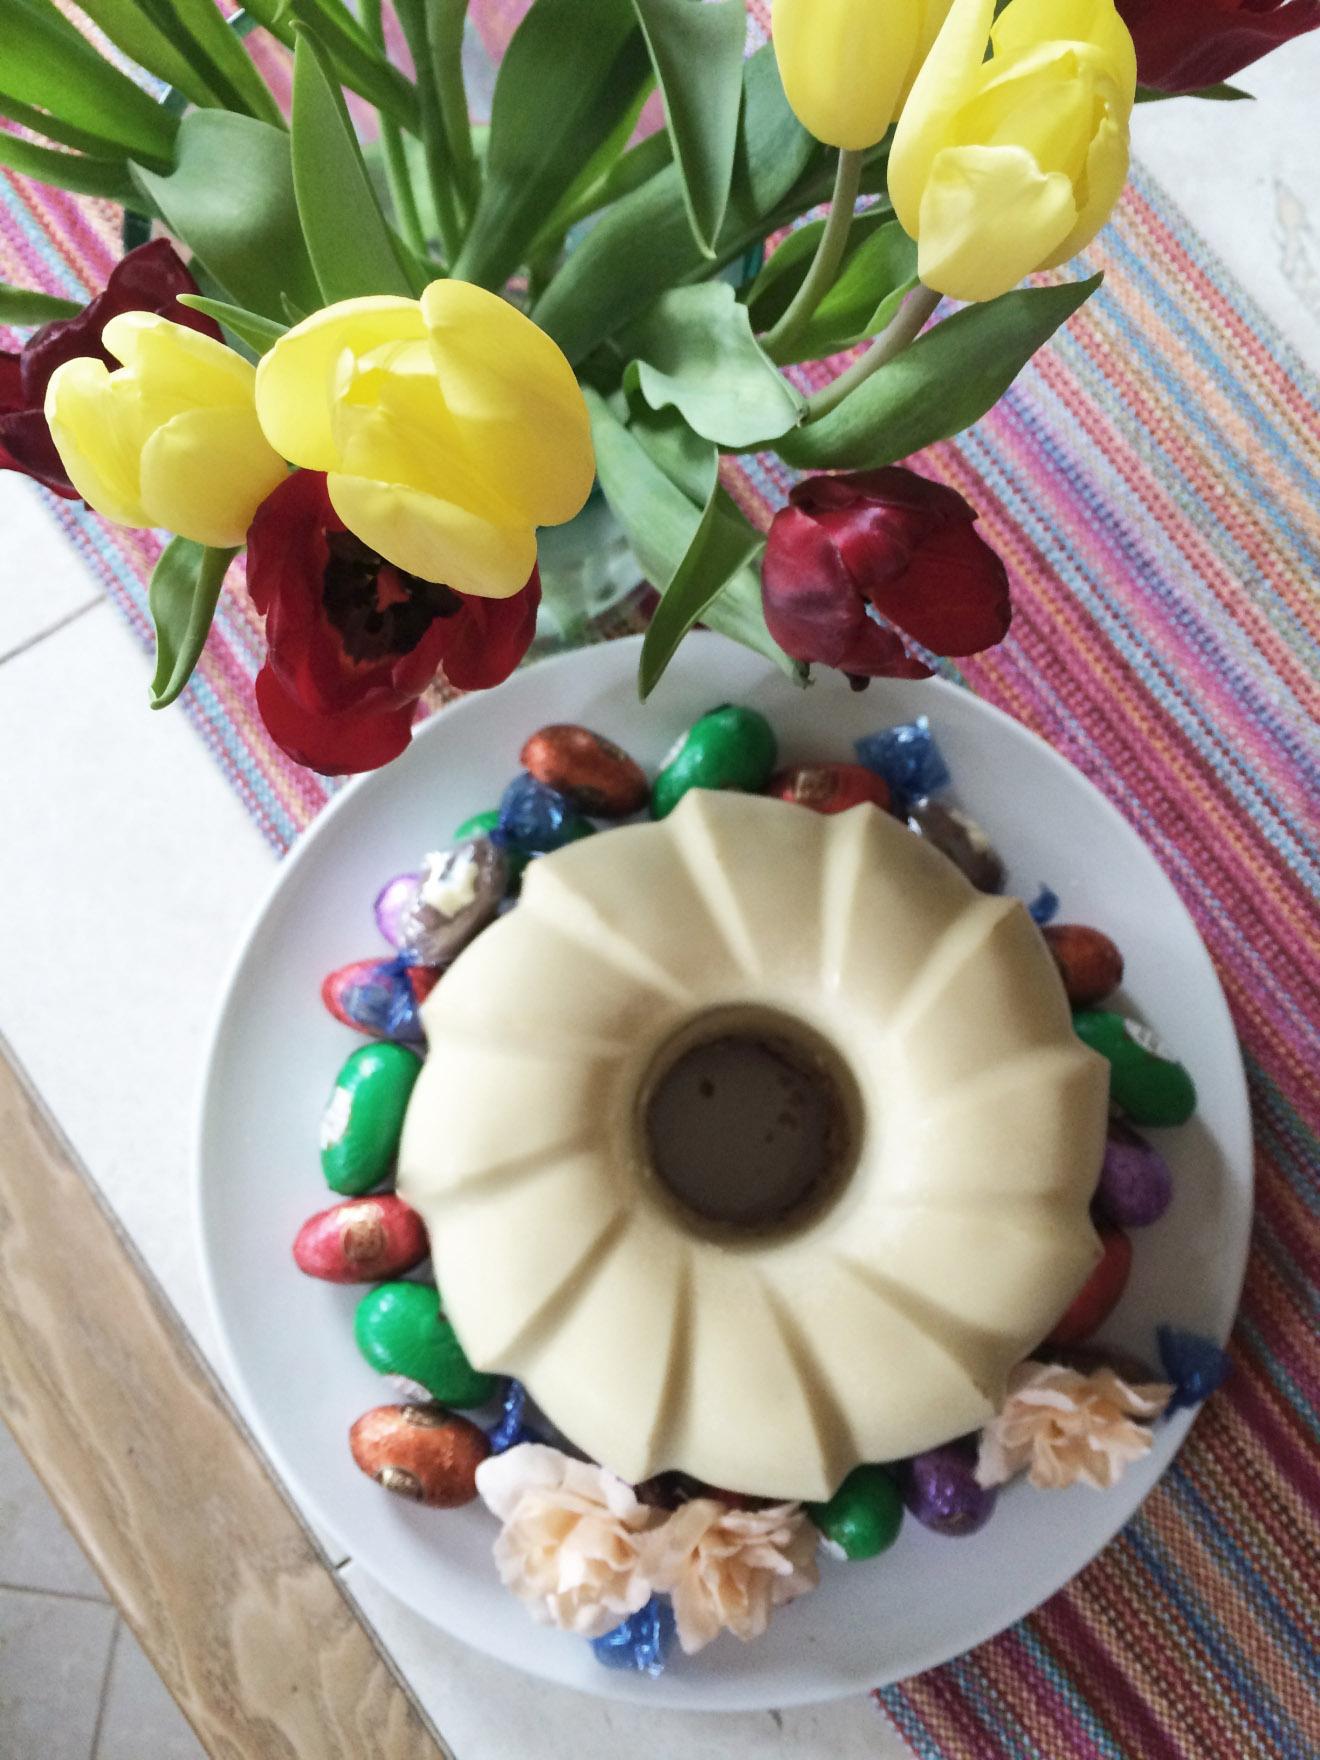 Kuchenglasur WeiГџe Schokolade